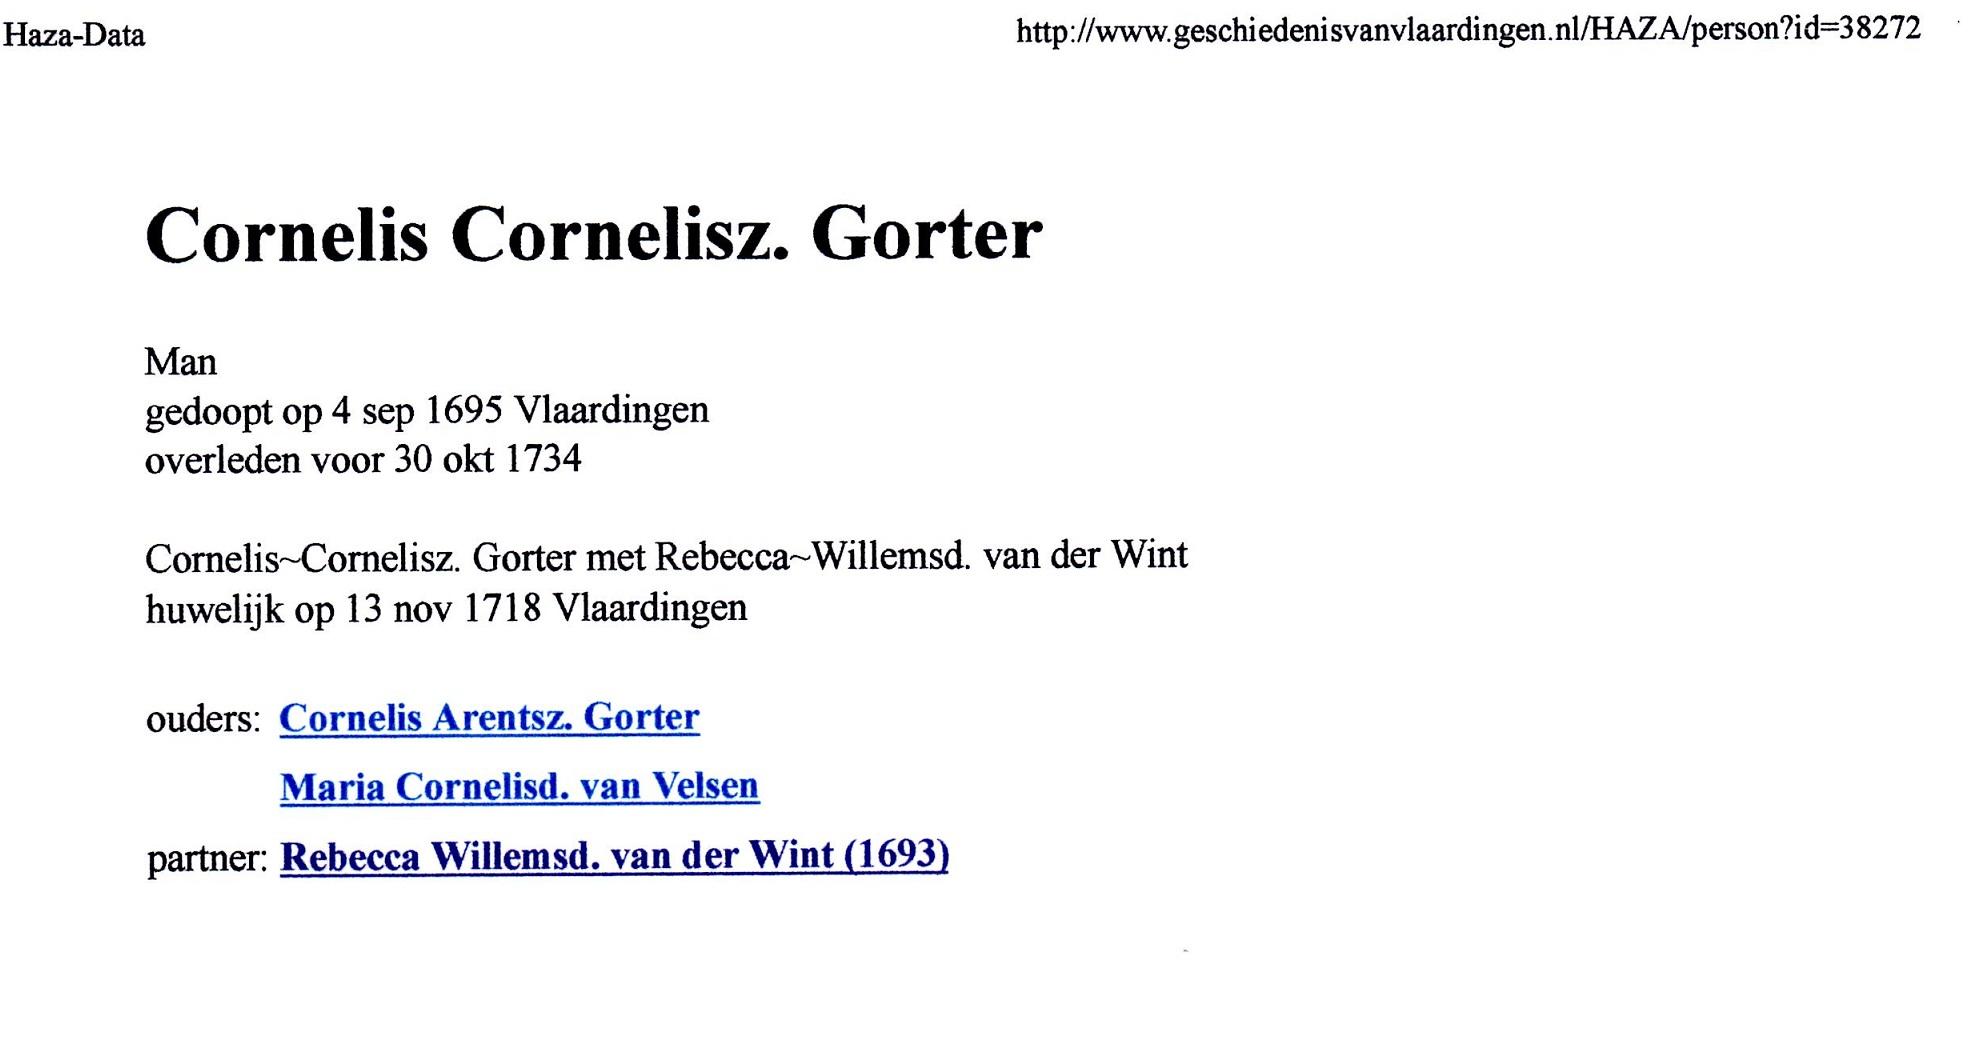 1695-09-04 Cornelis Cornelisz Gorter